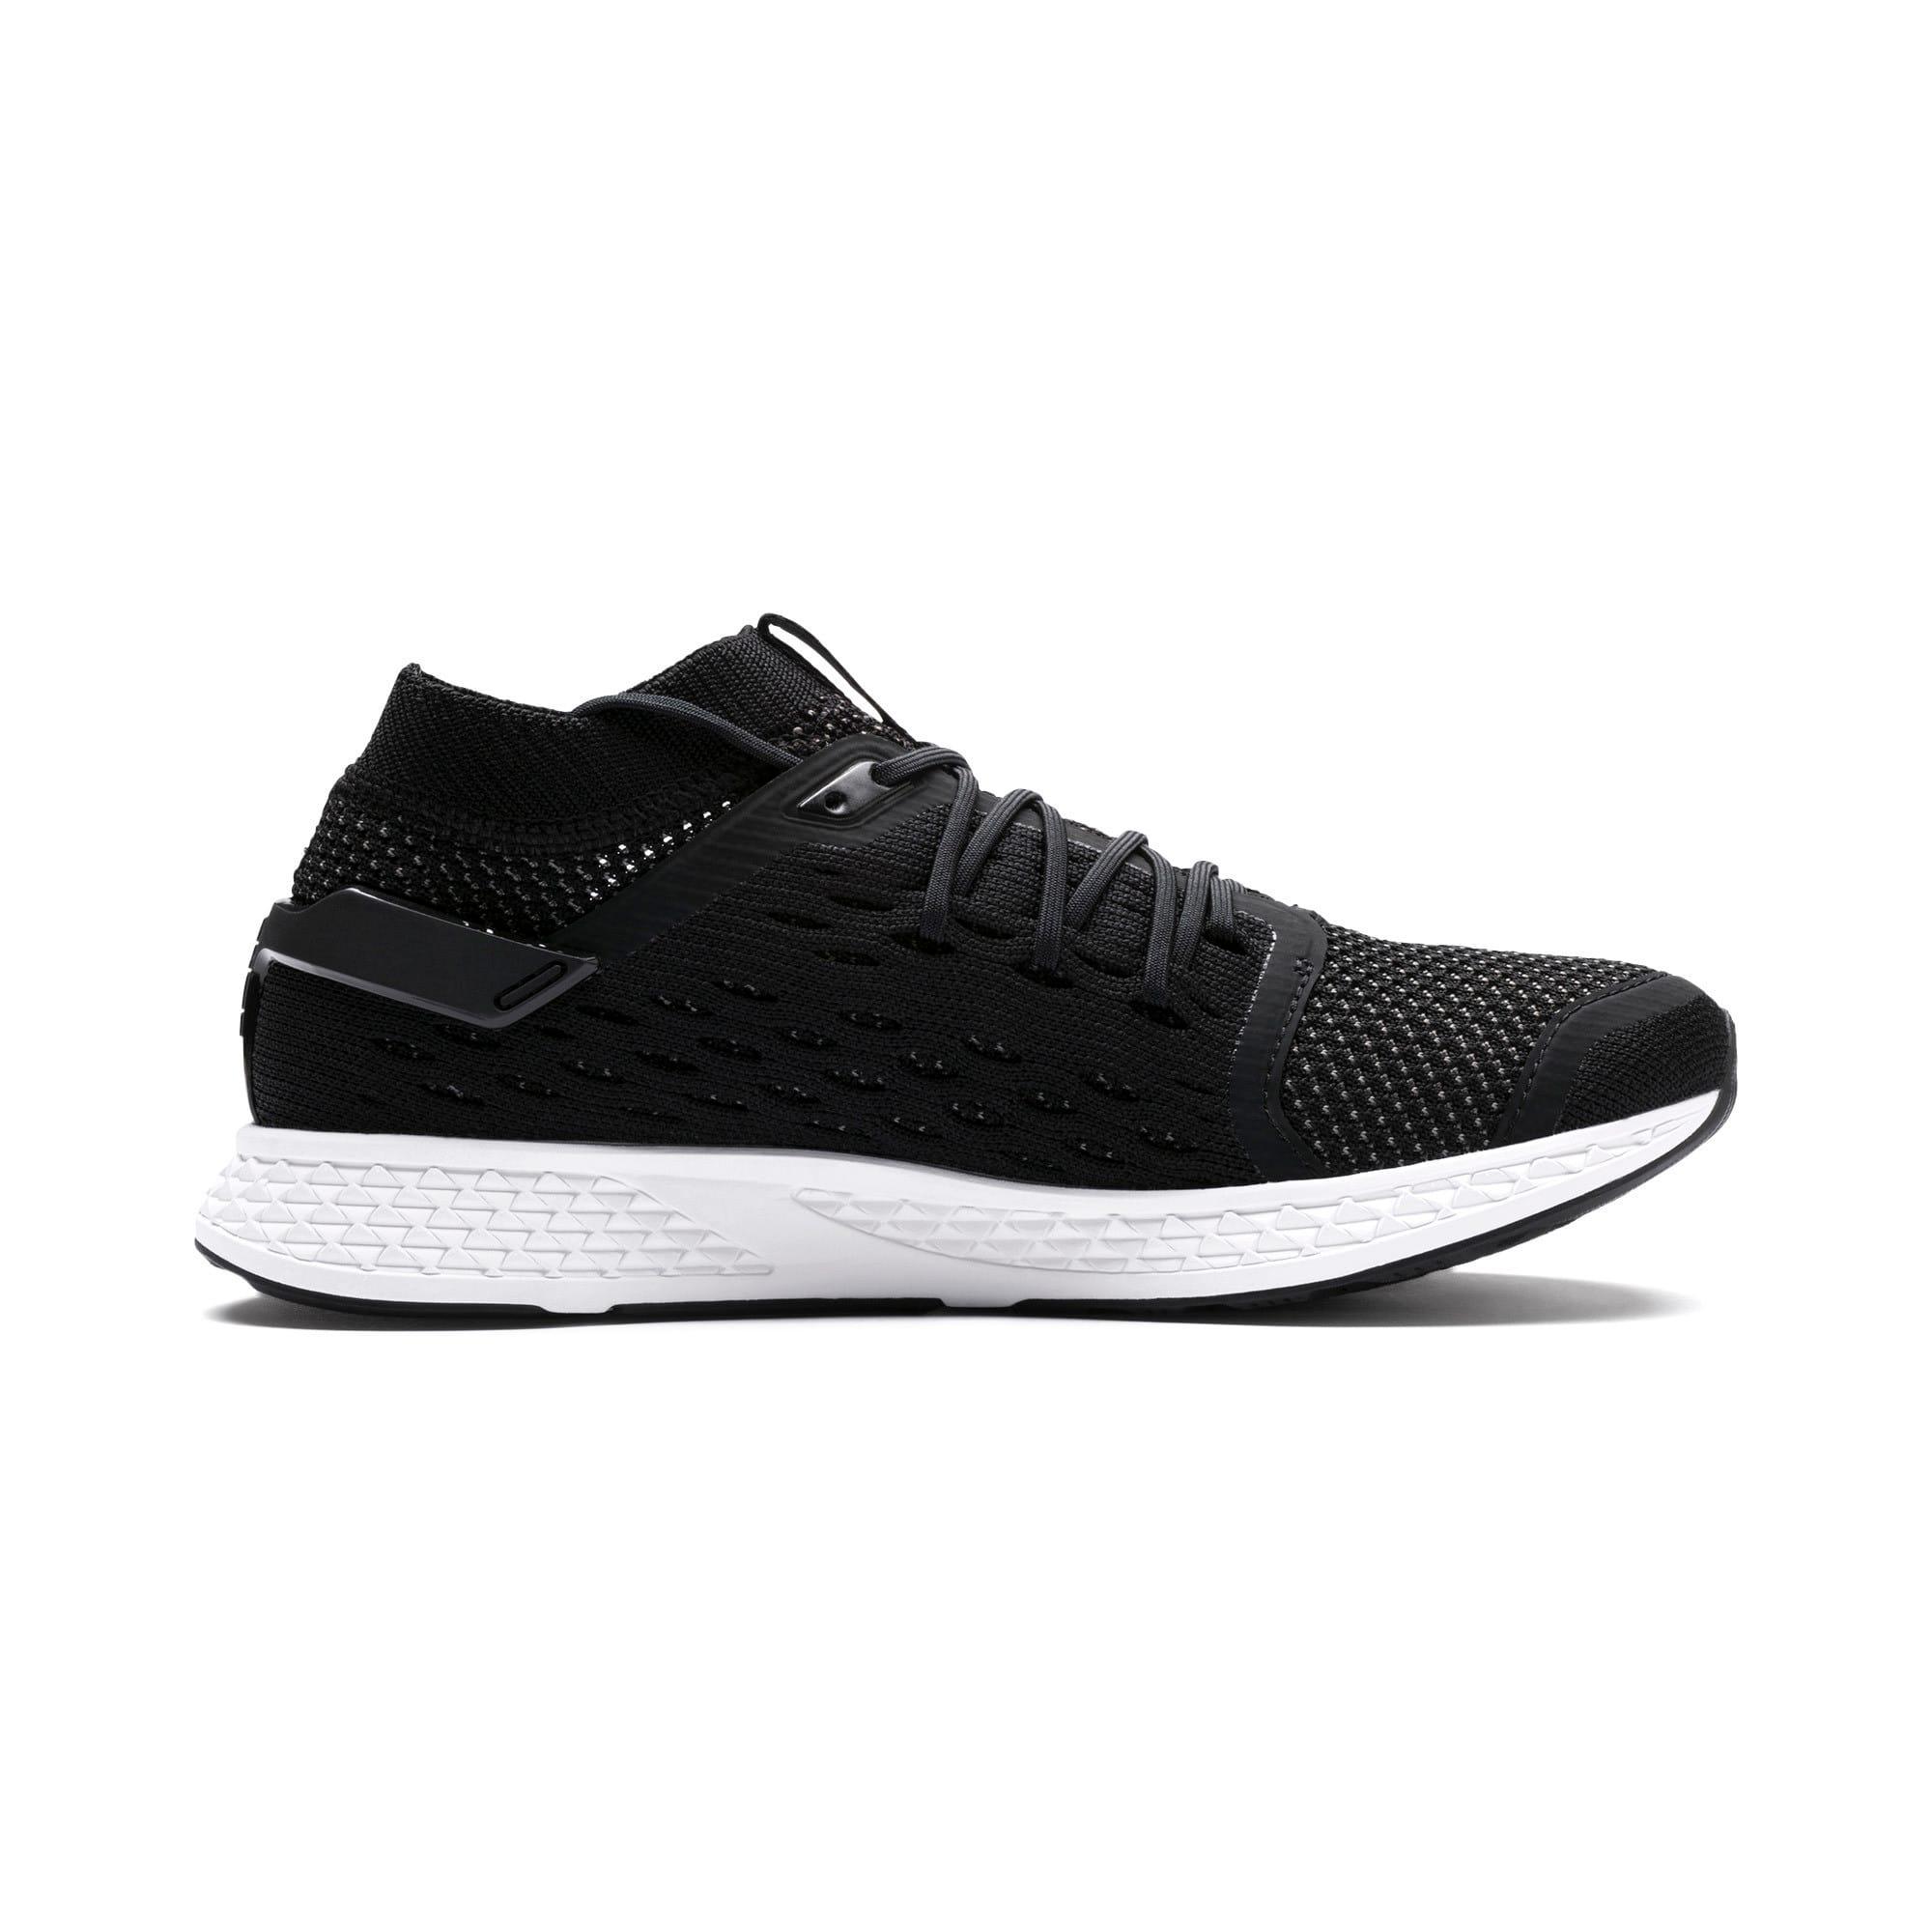 Thumbnail 6 of SPEED 500 Women's Running Shoes, Puma Black-Puma White, medium